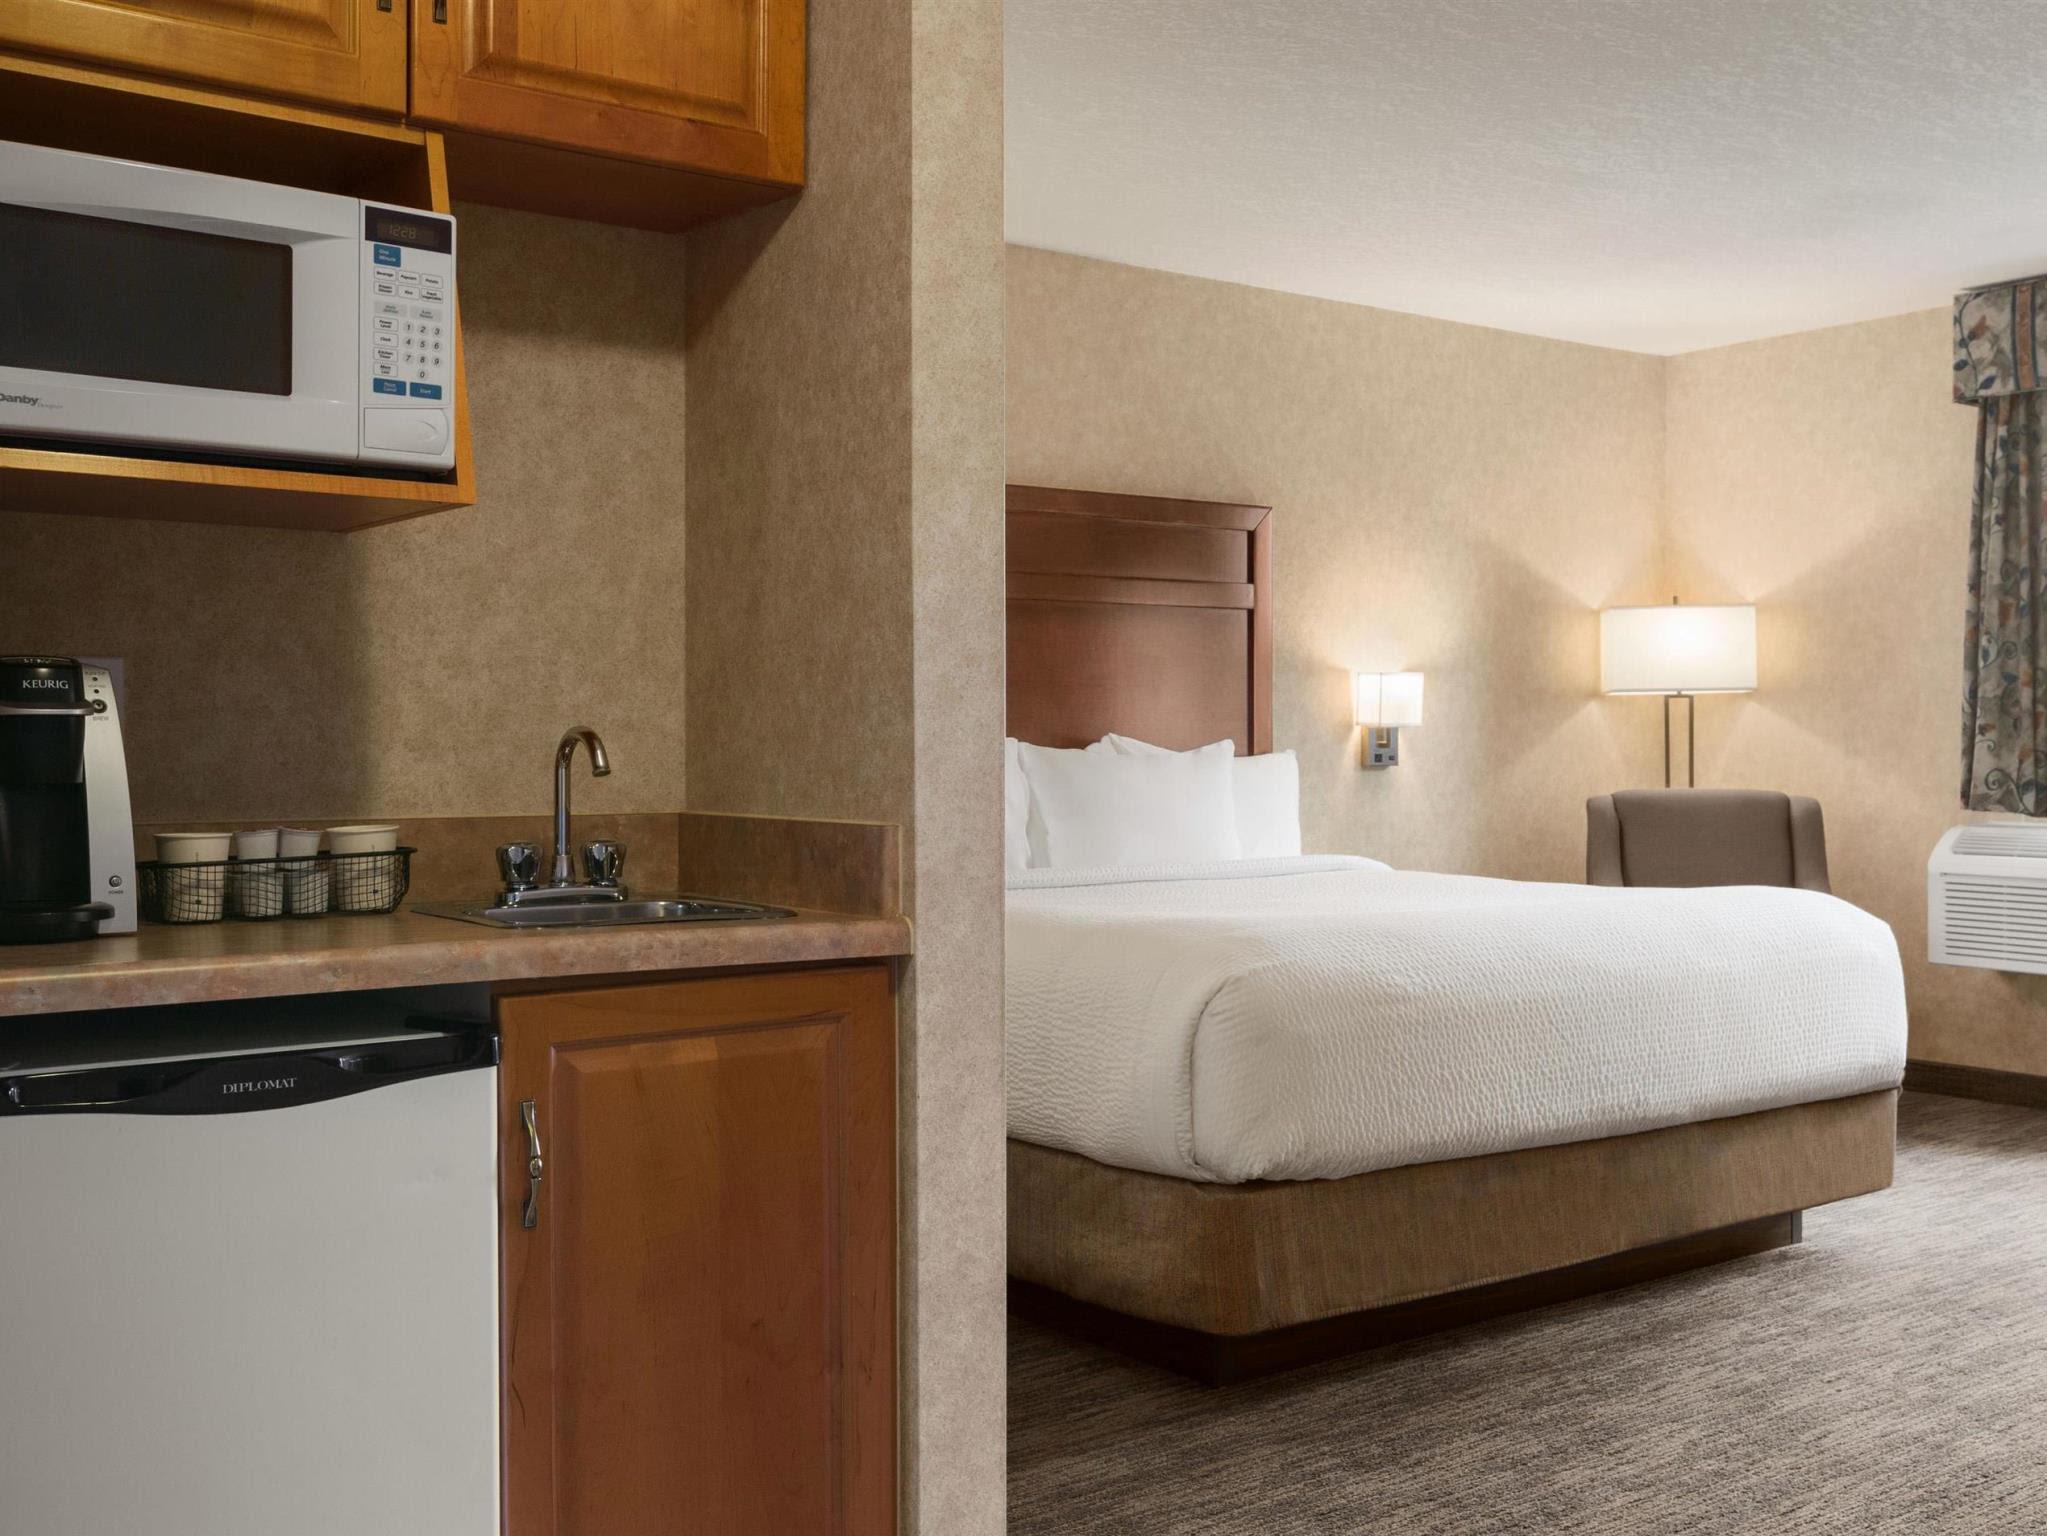 Price Days Inn & Suites by Wyndham Brooks